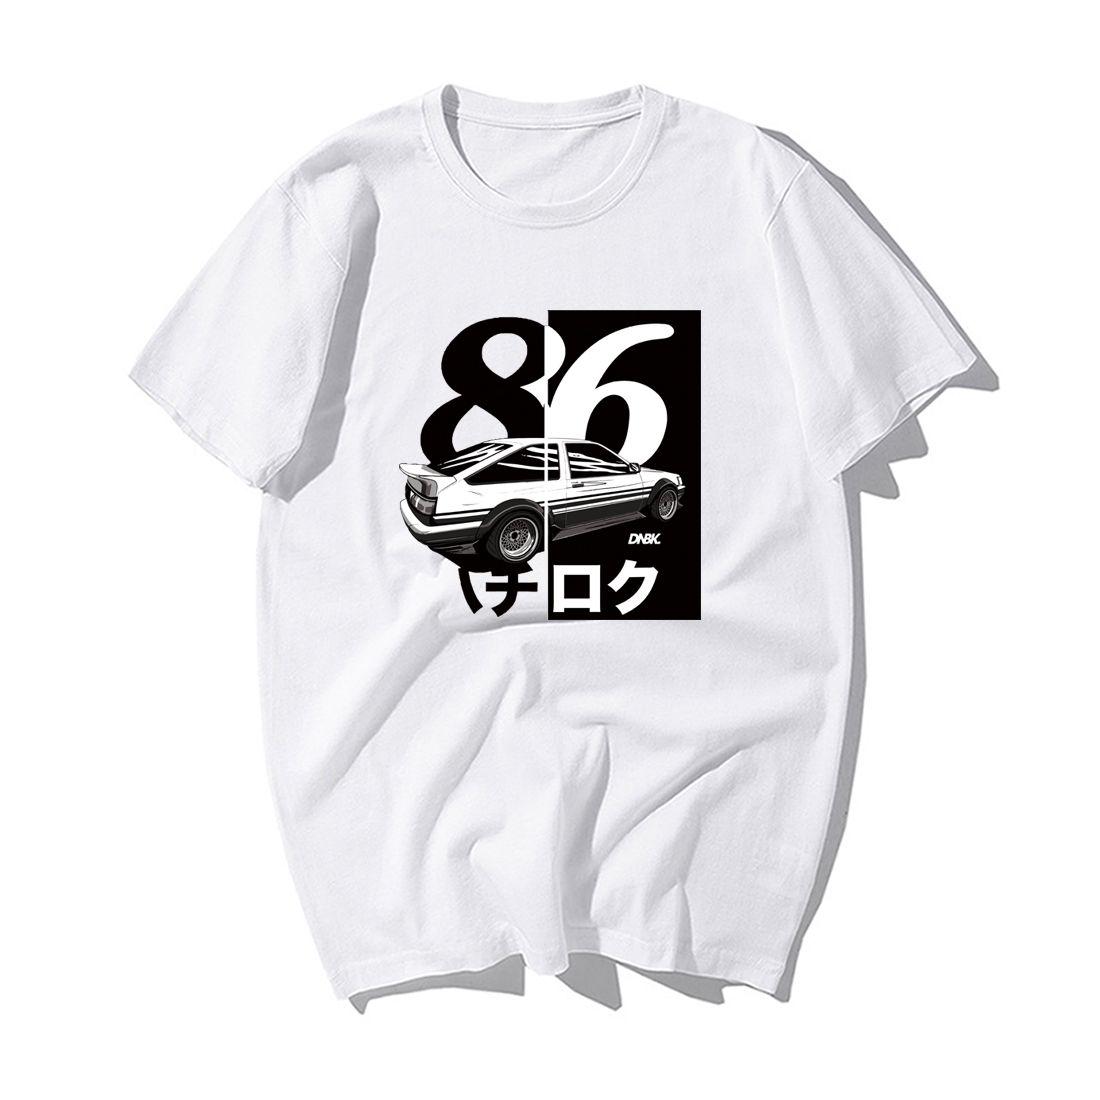 Homens Verão moda japonesa Deriva Anime D inicial T camisa legal mangas Cotton curto T-shirt Casual Ae86 Initial D Homme Camiseta